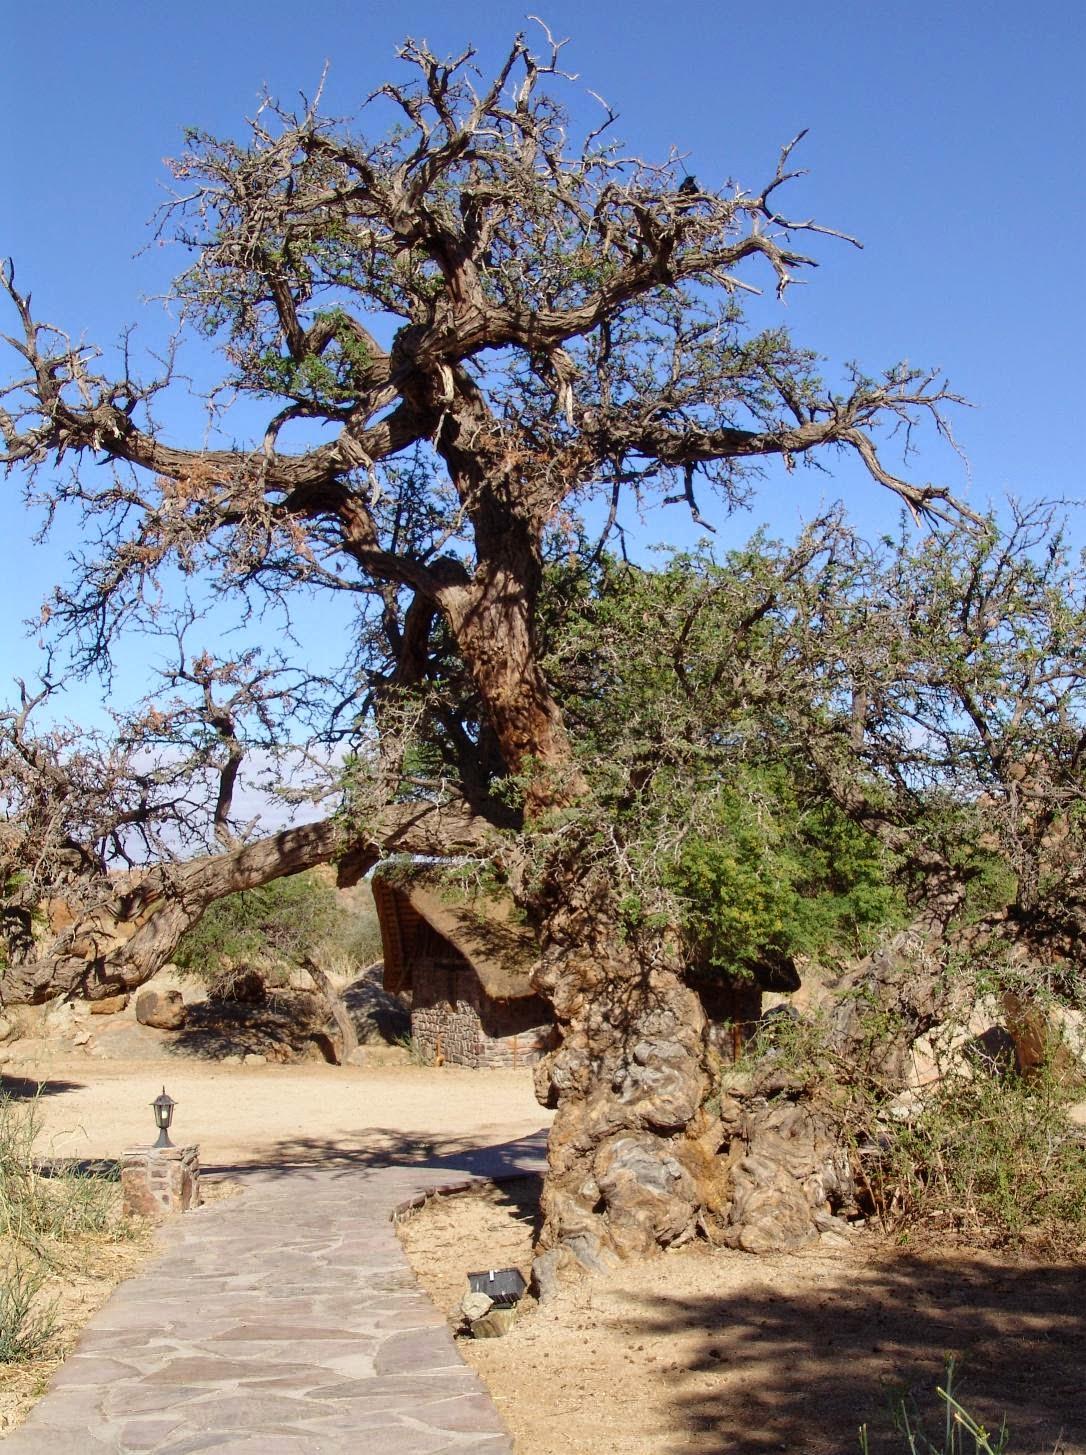 Canyon Lodge Nambia - www.namibweb.com/canyonl.htm